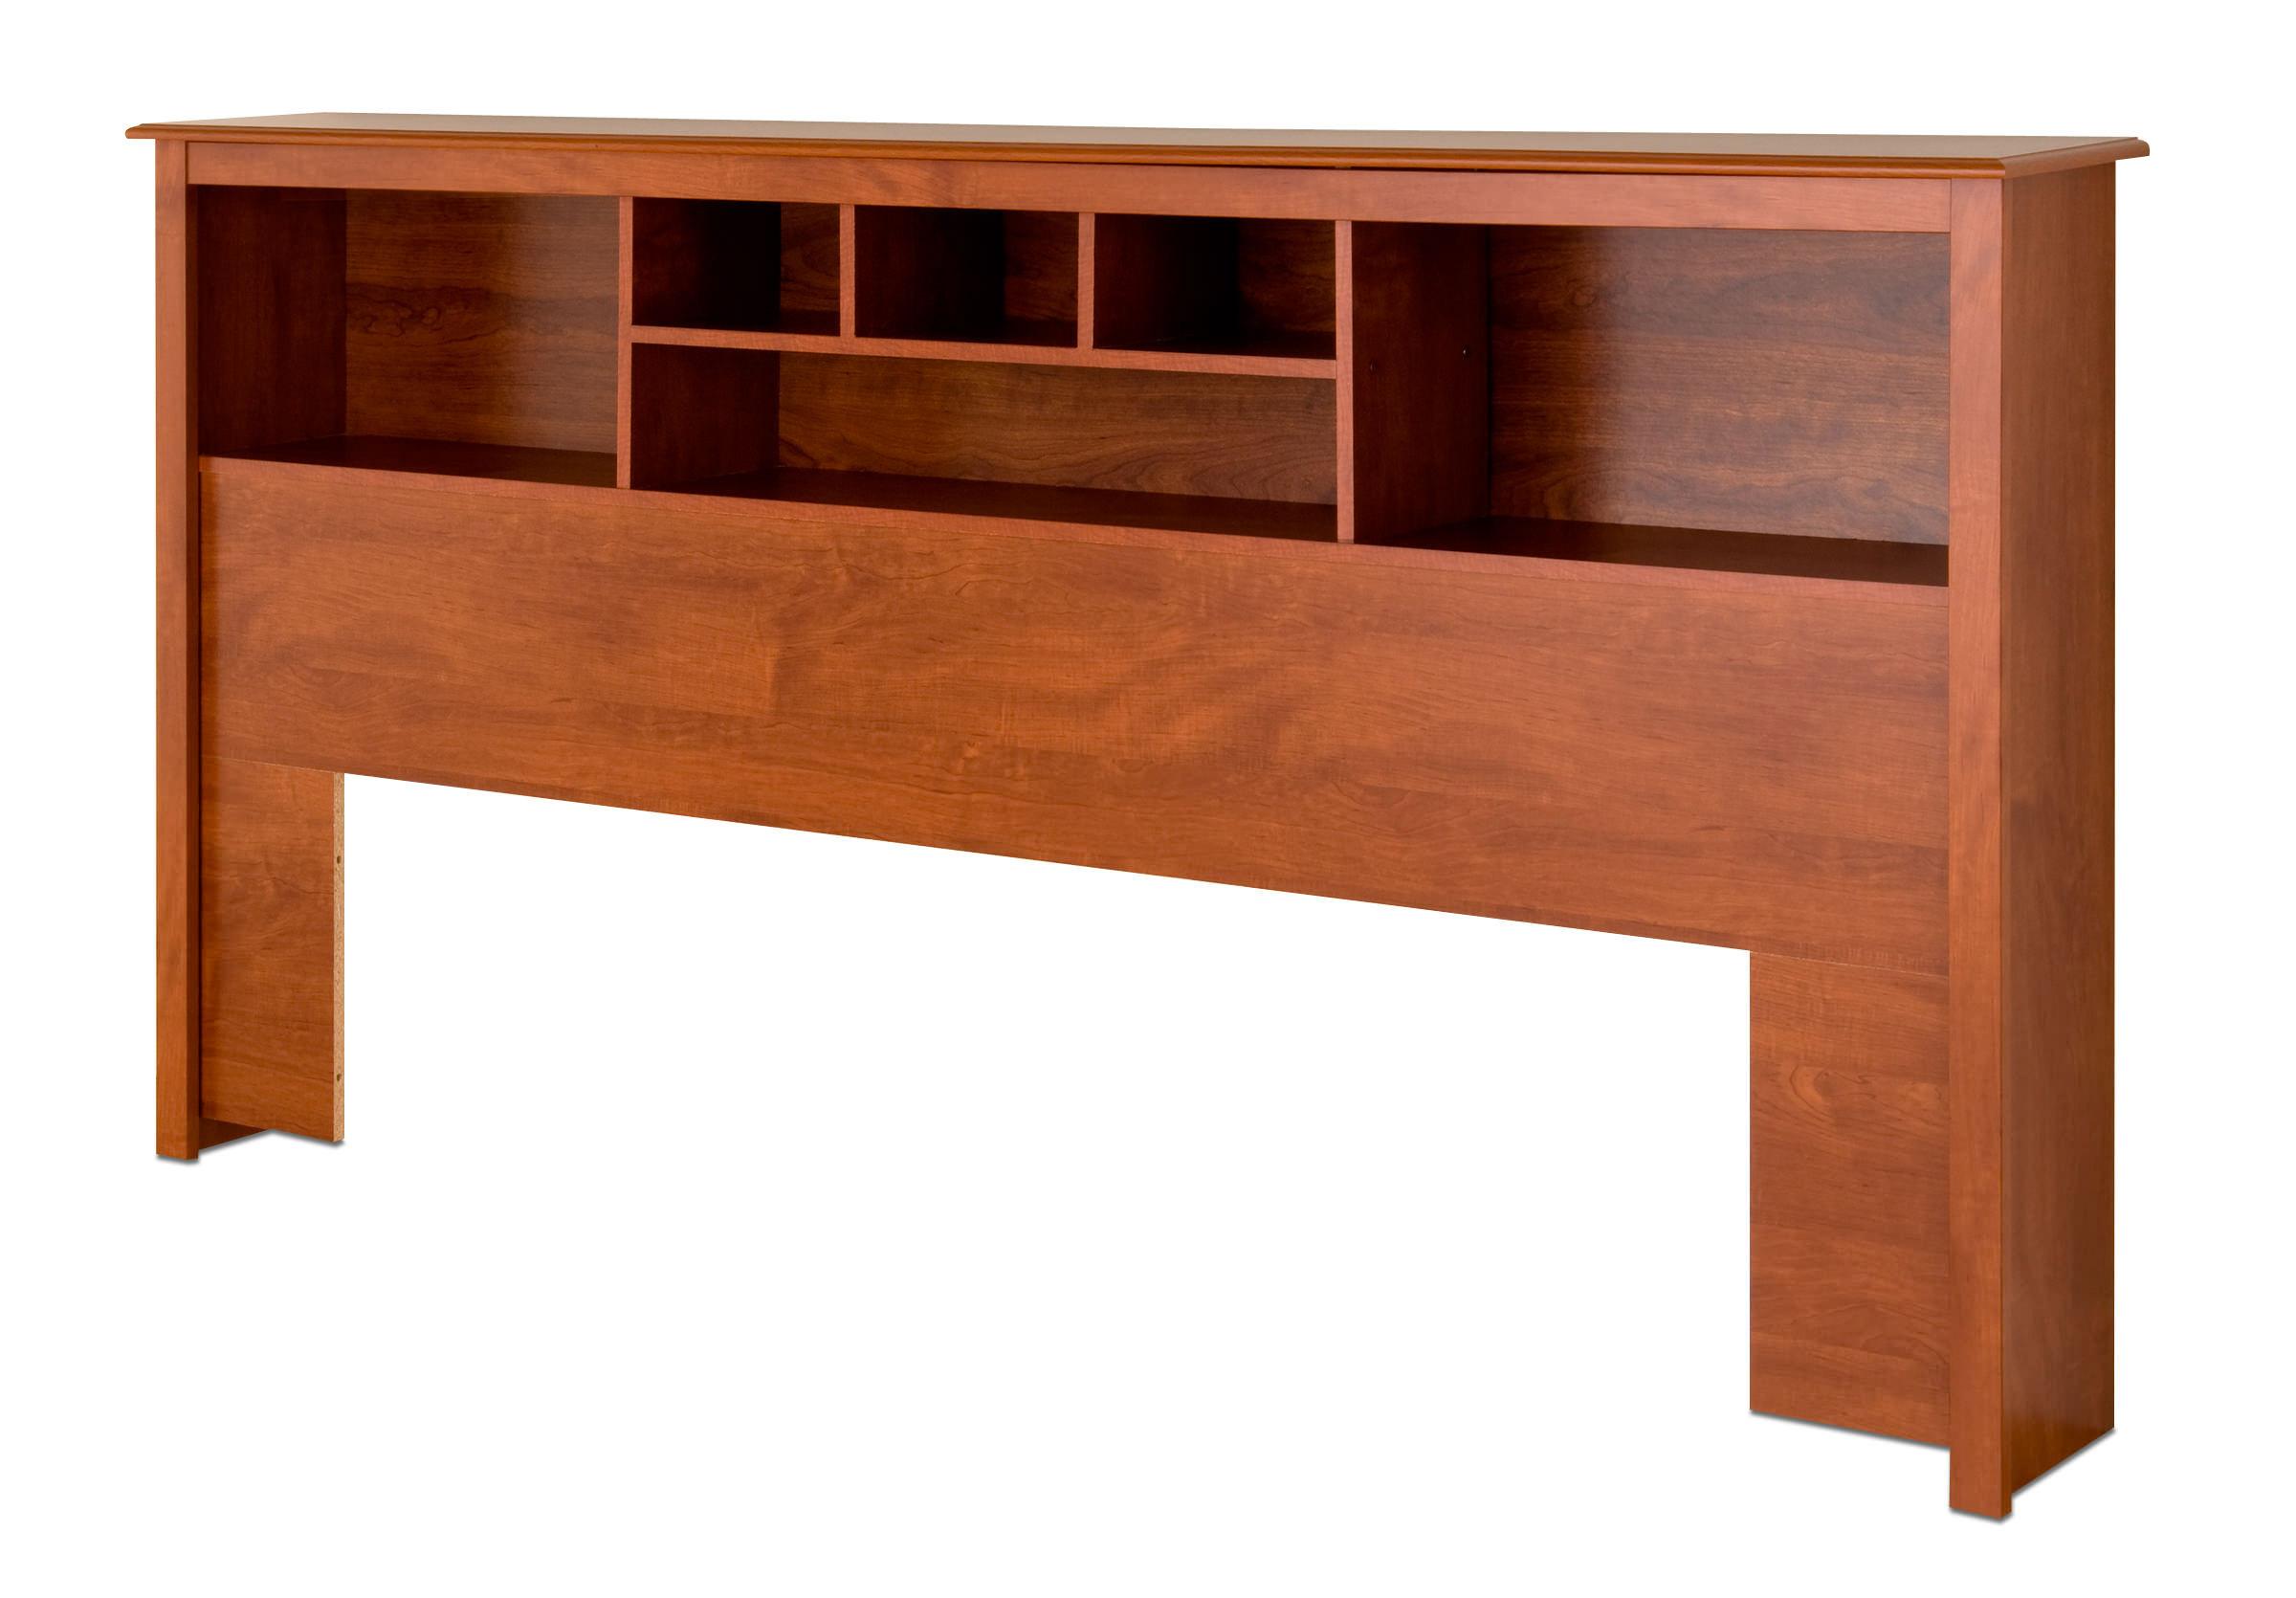 amys breathtaking shelf inspiration bed twin design bookshelf pics headboard office